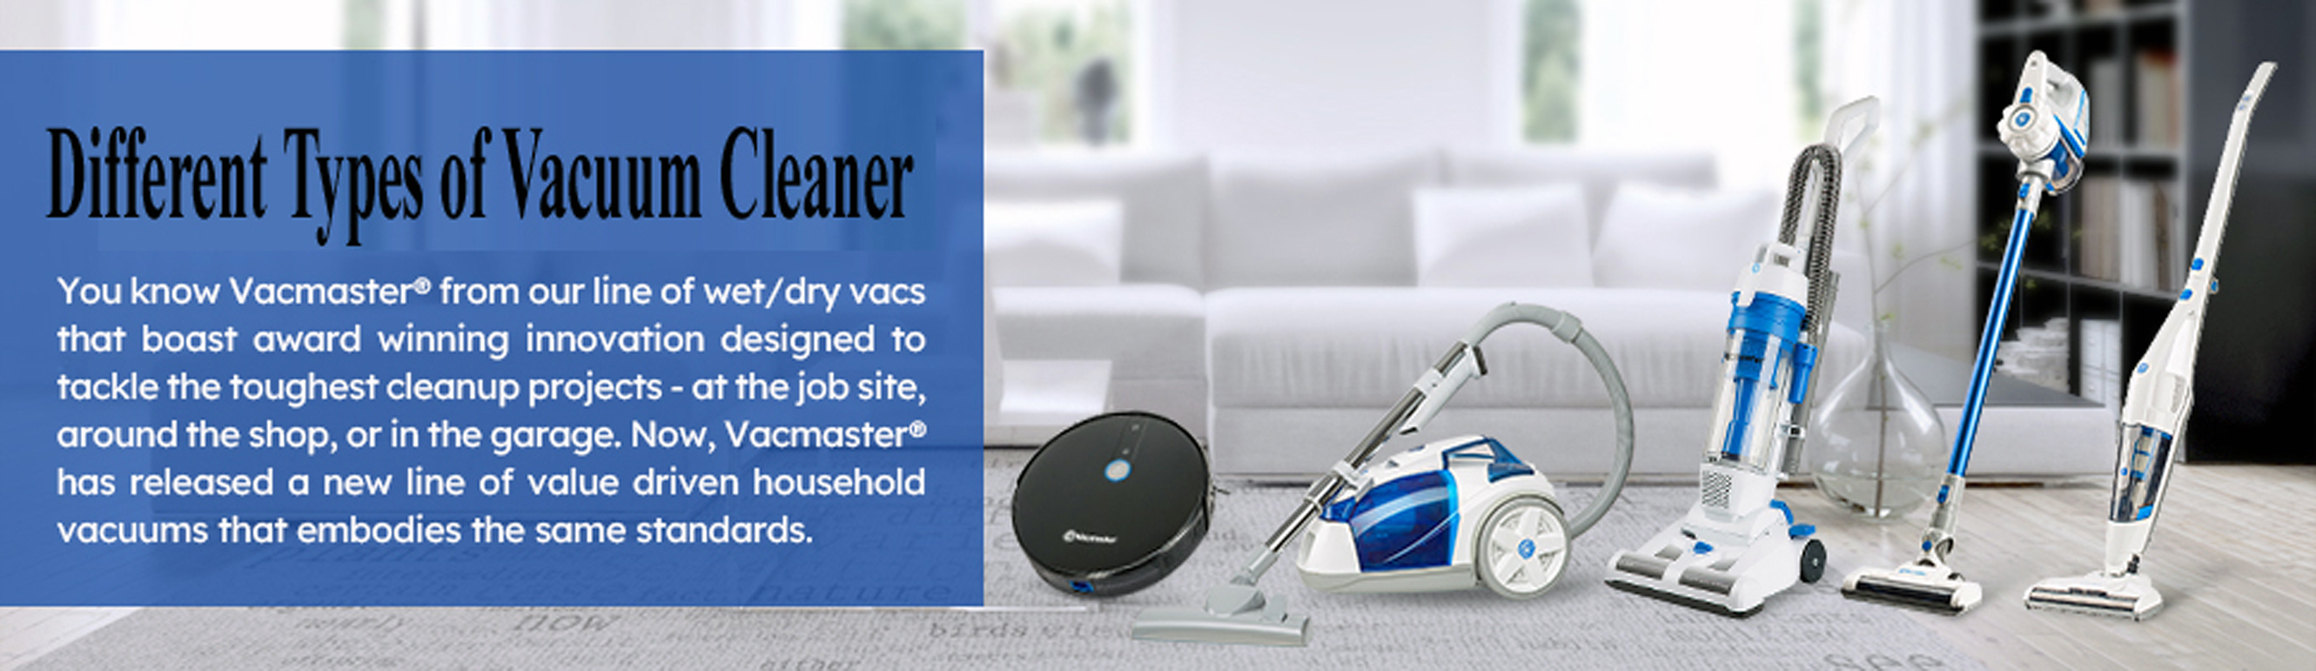 Different Types of Vacuum Cleaner